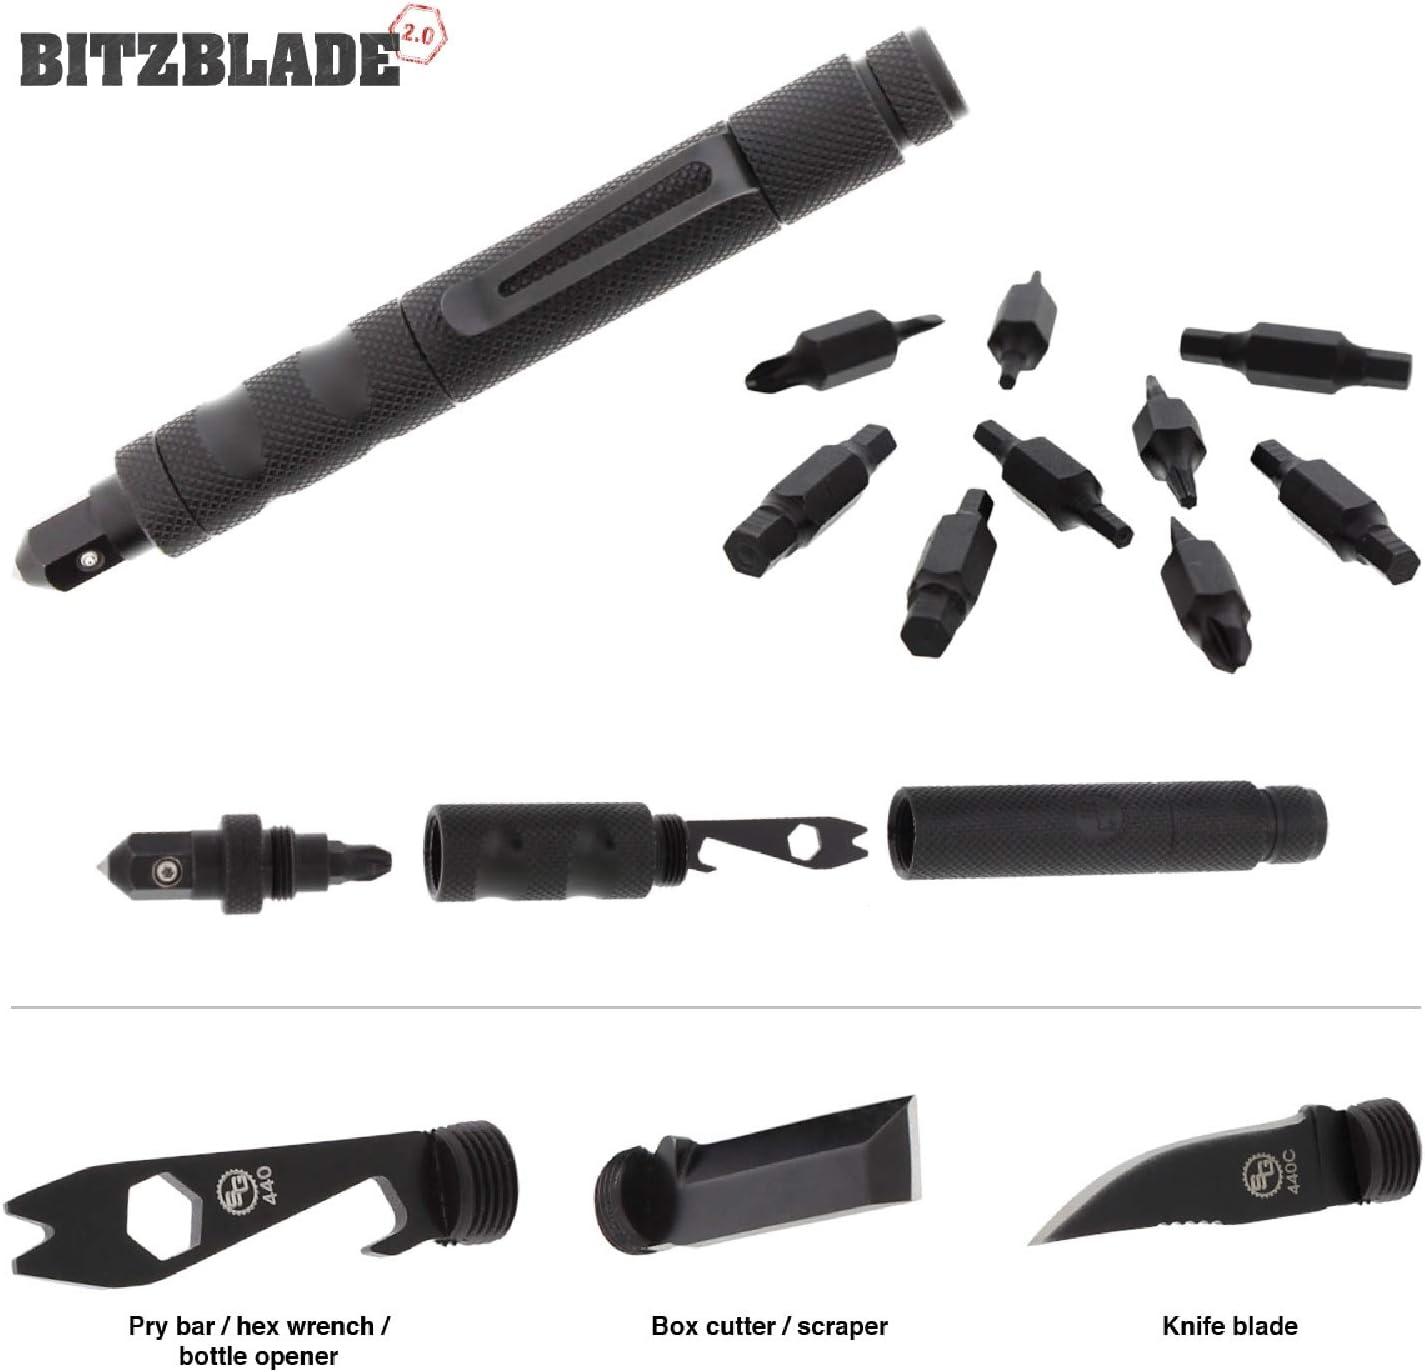 StatGear BITZBLADE-BLK Bitzblade 2.0 Multi-Tool